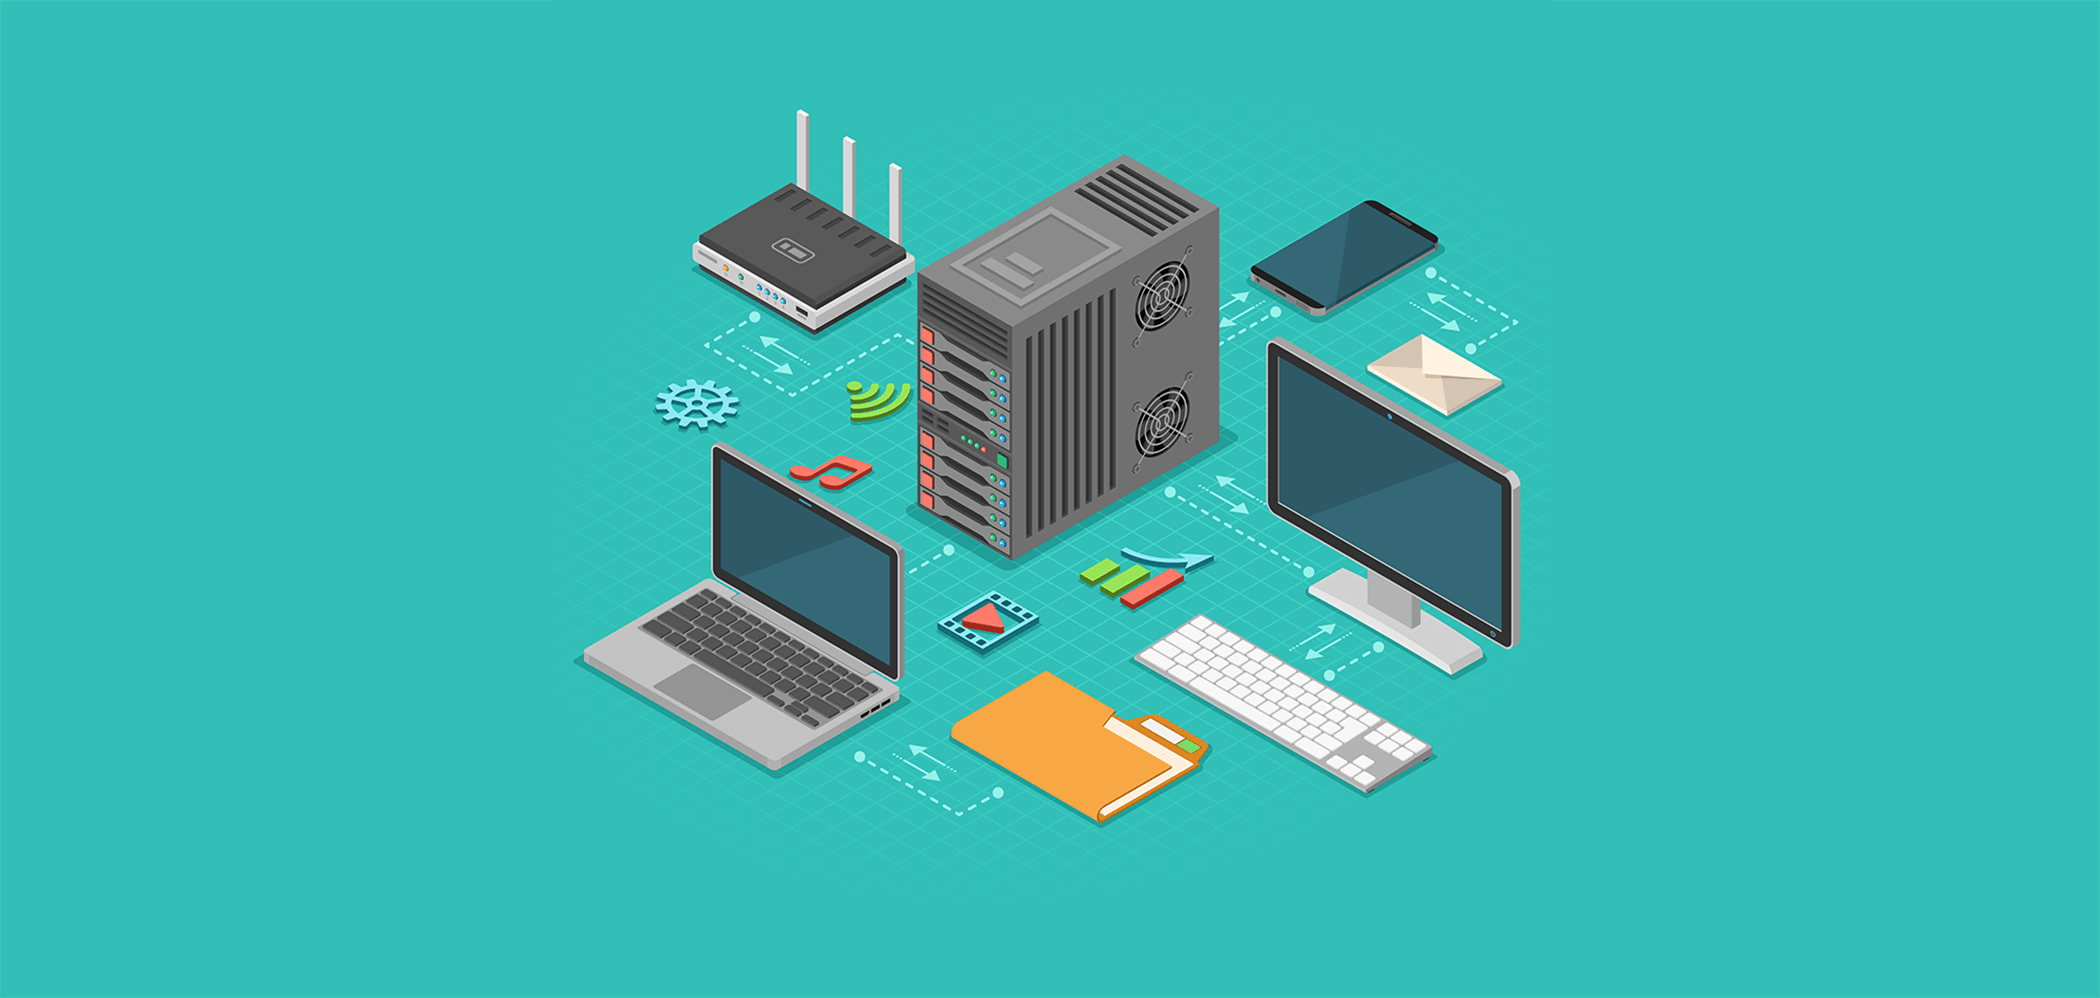 Optimizing WiFi Performance: Common Wireless Network Design Mistakes to Avoid